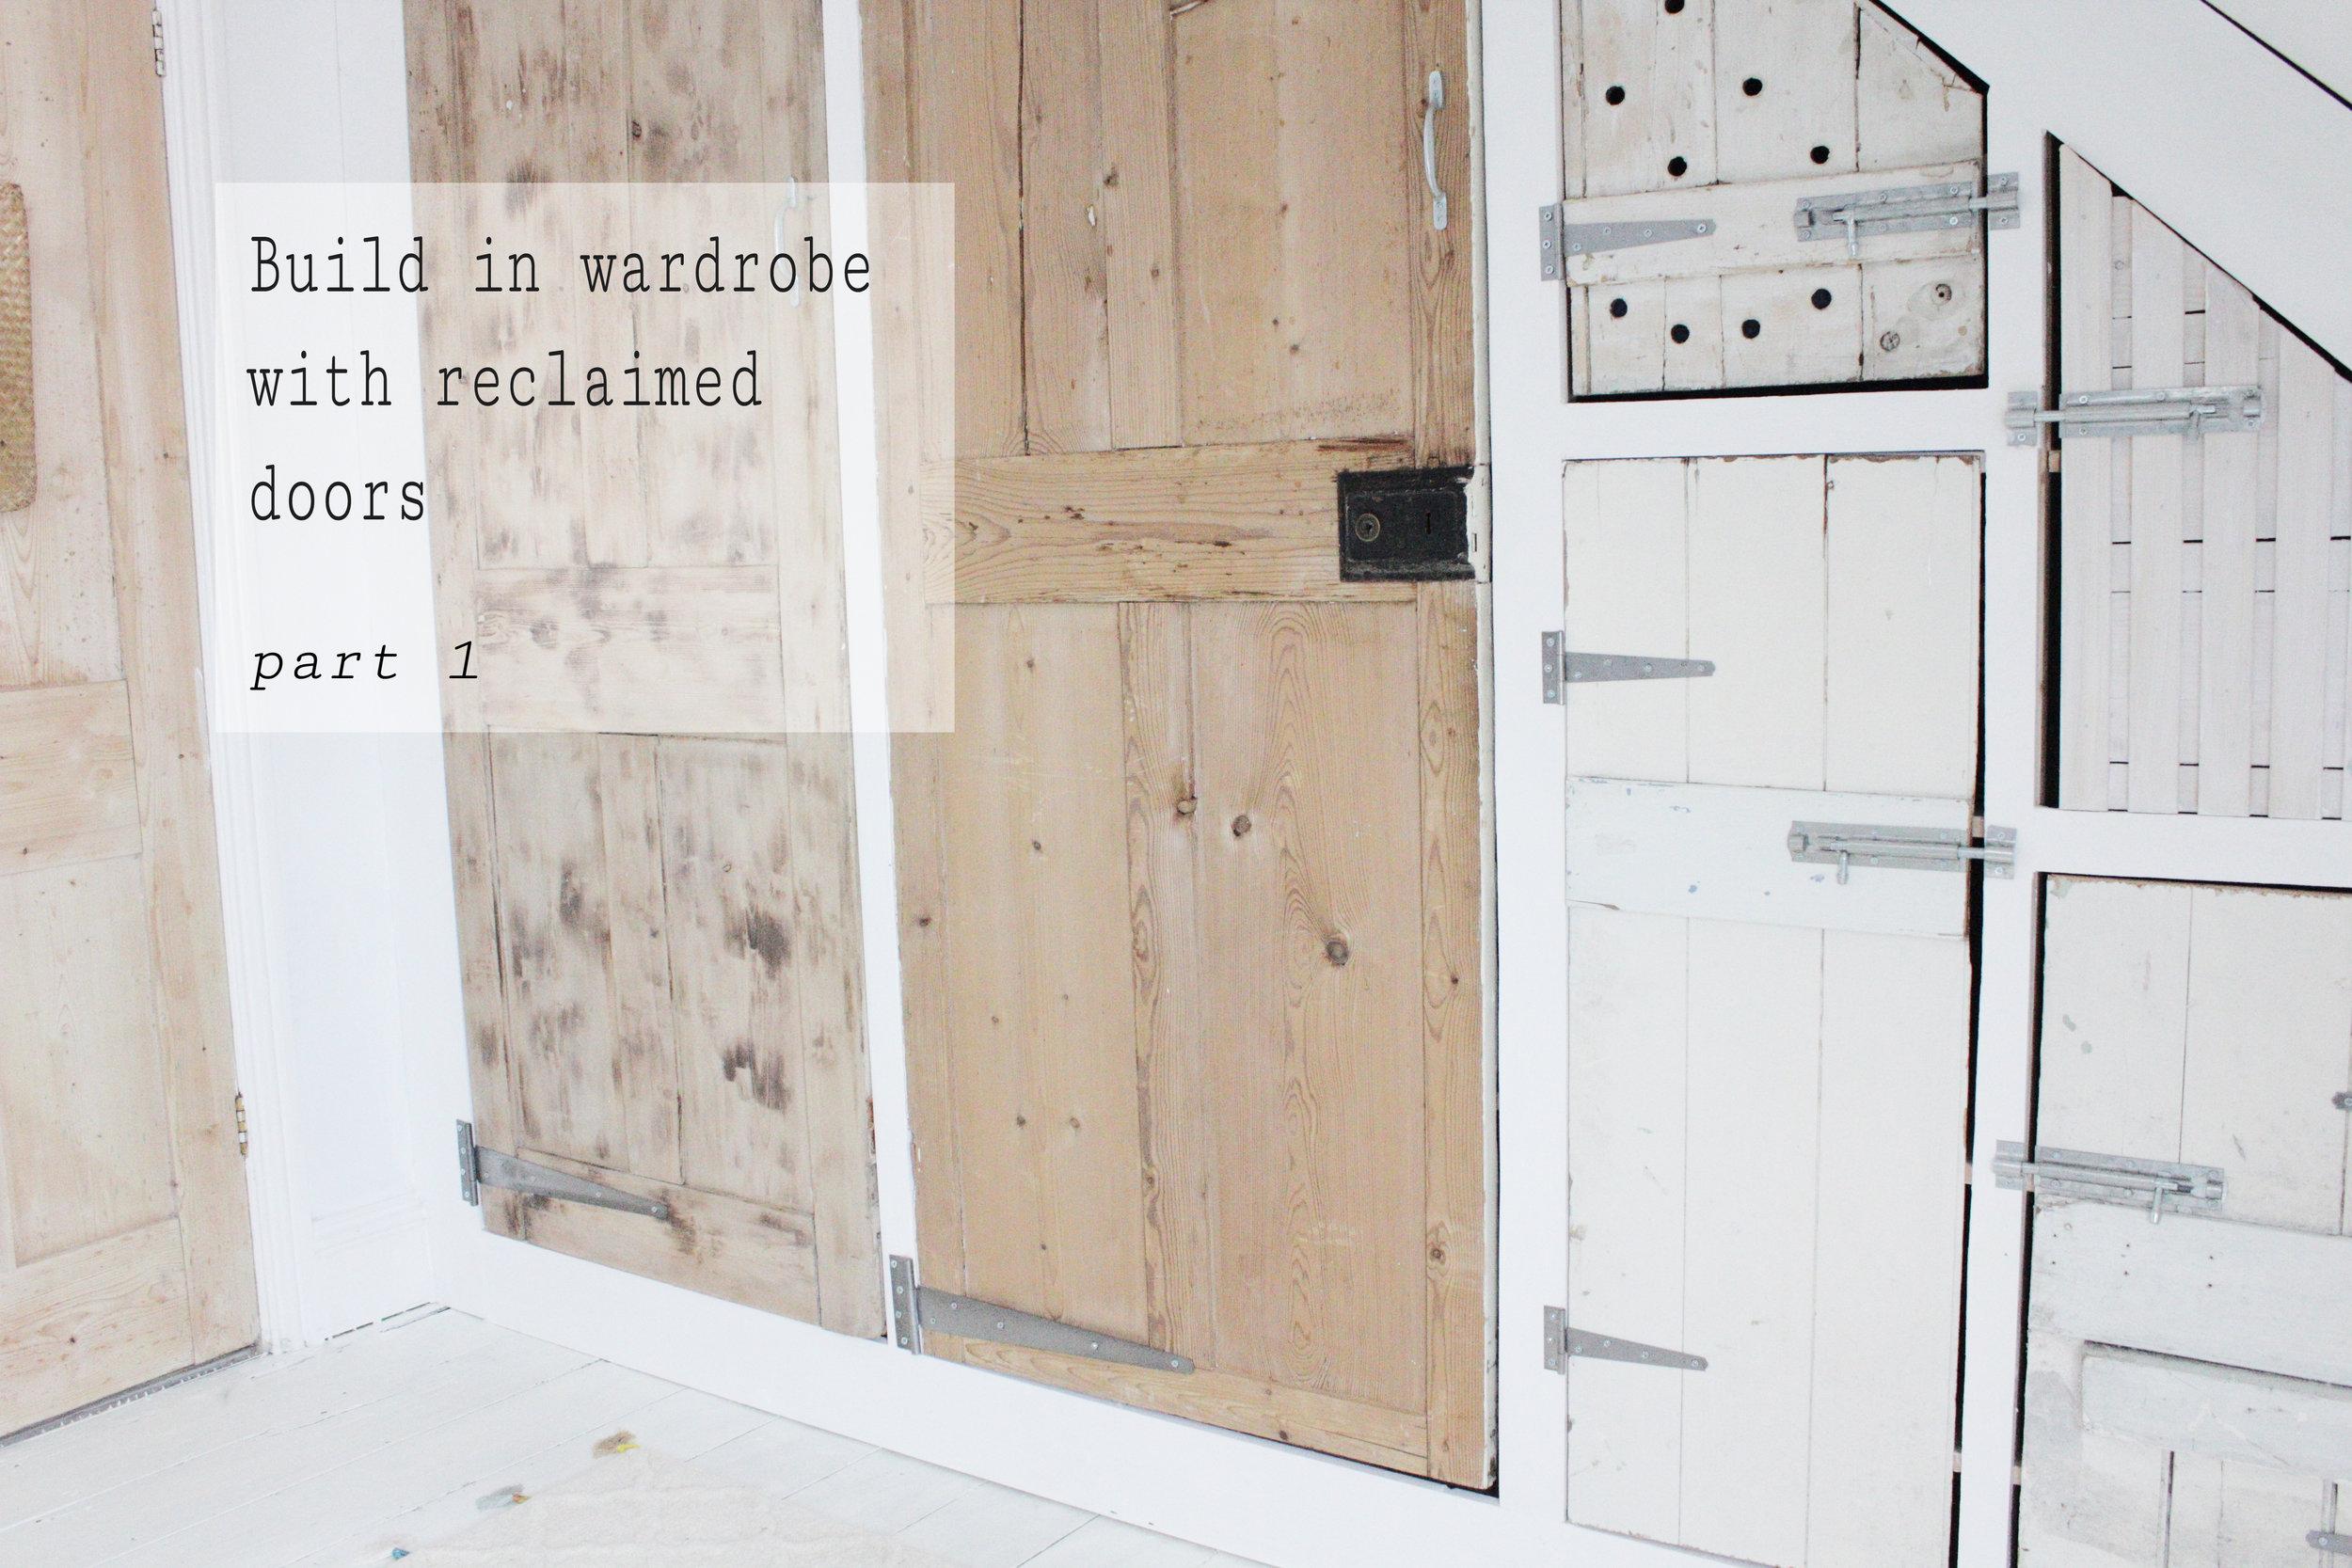 build a wardrobe using an Ikea Ivar unit and reclaimed doors